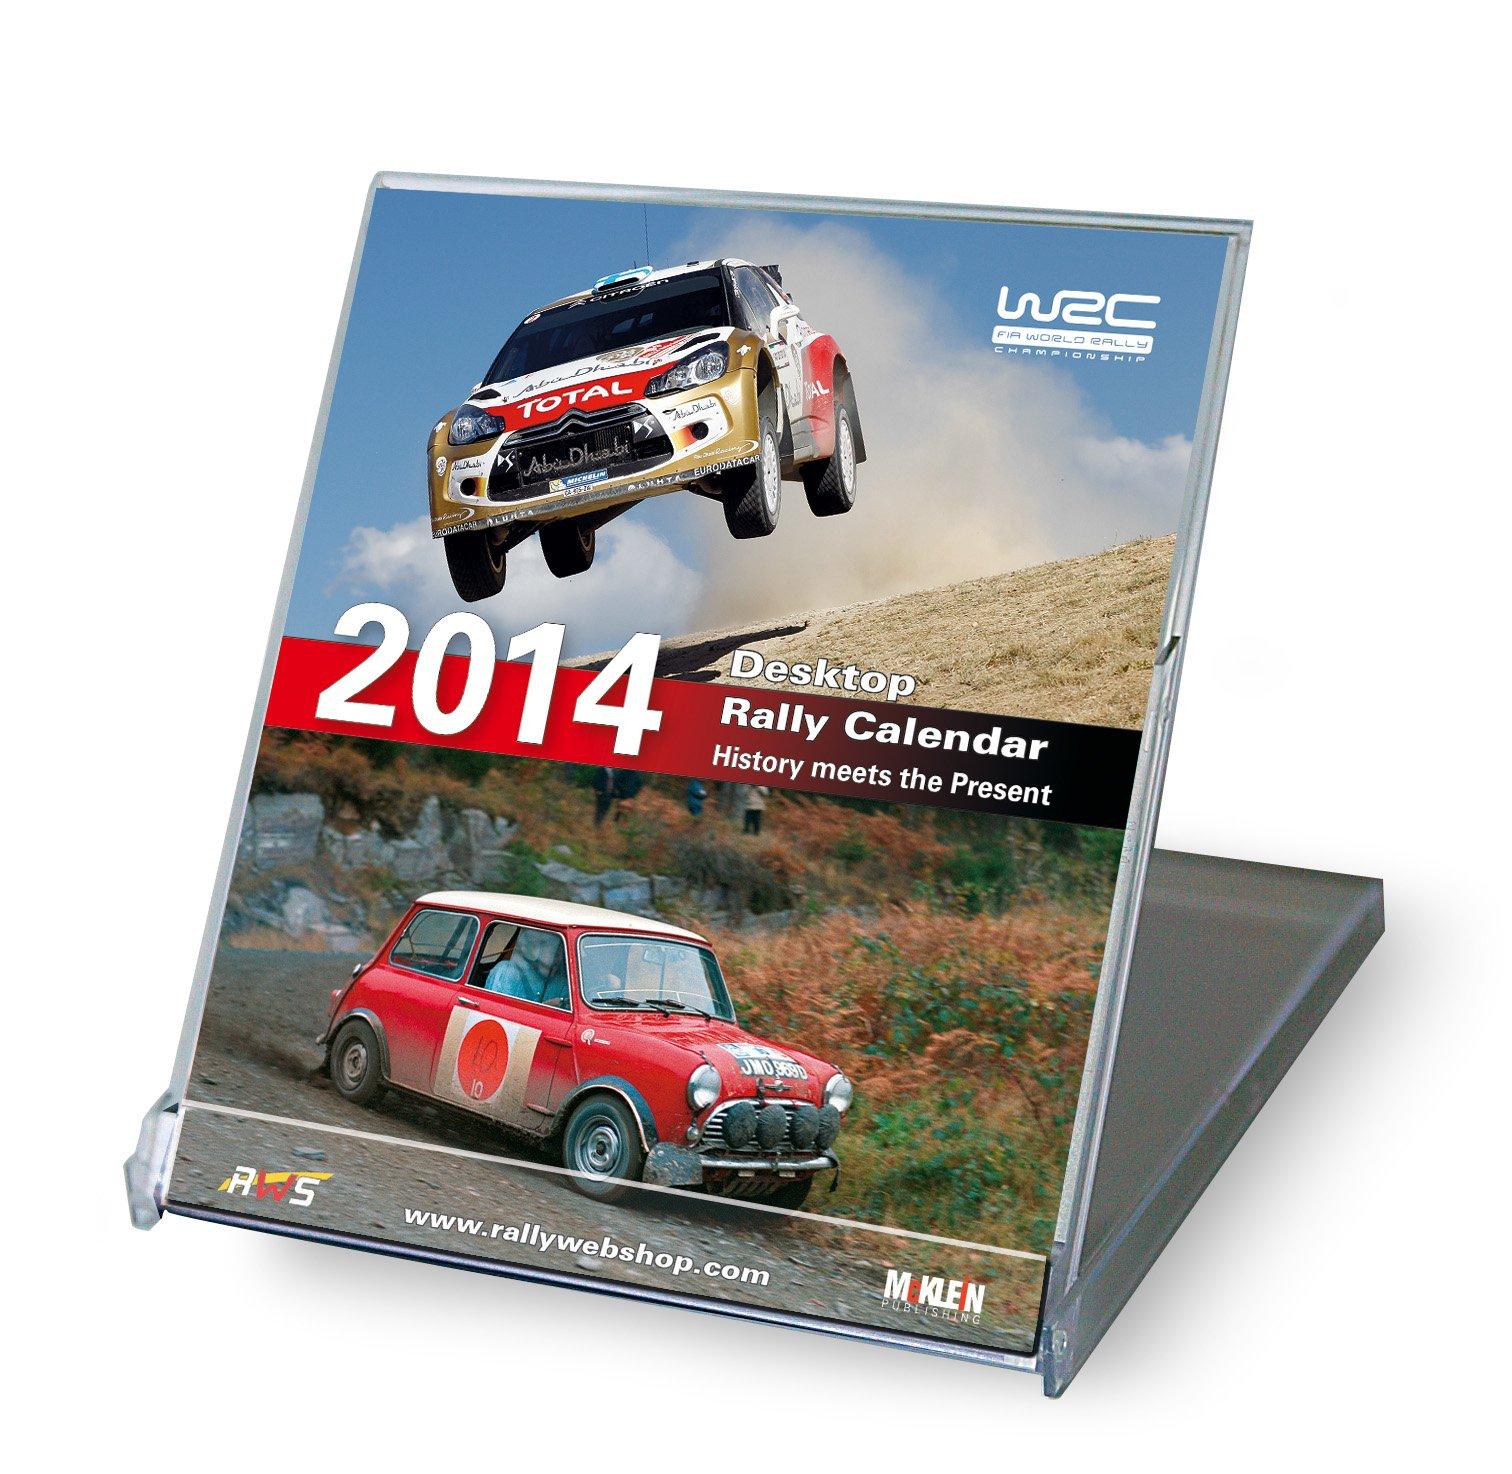 Desktop Rally Calendar 2014: History meets the Present